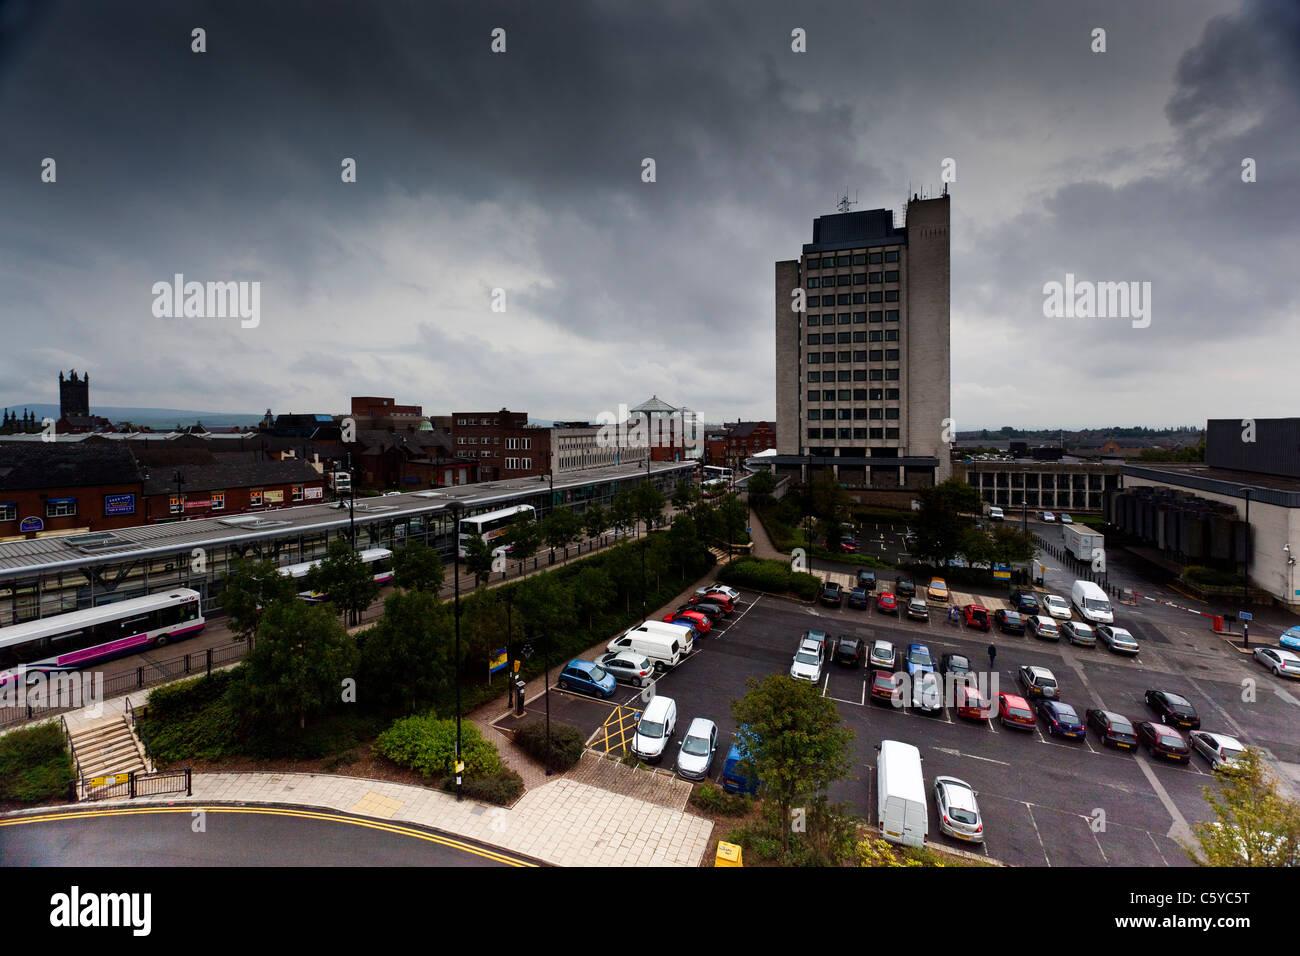 Oldham civic centre - Stock Image